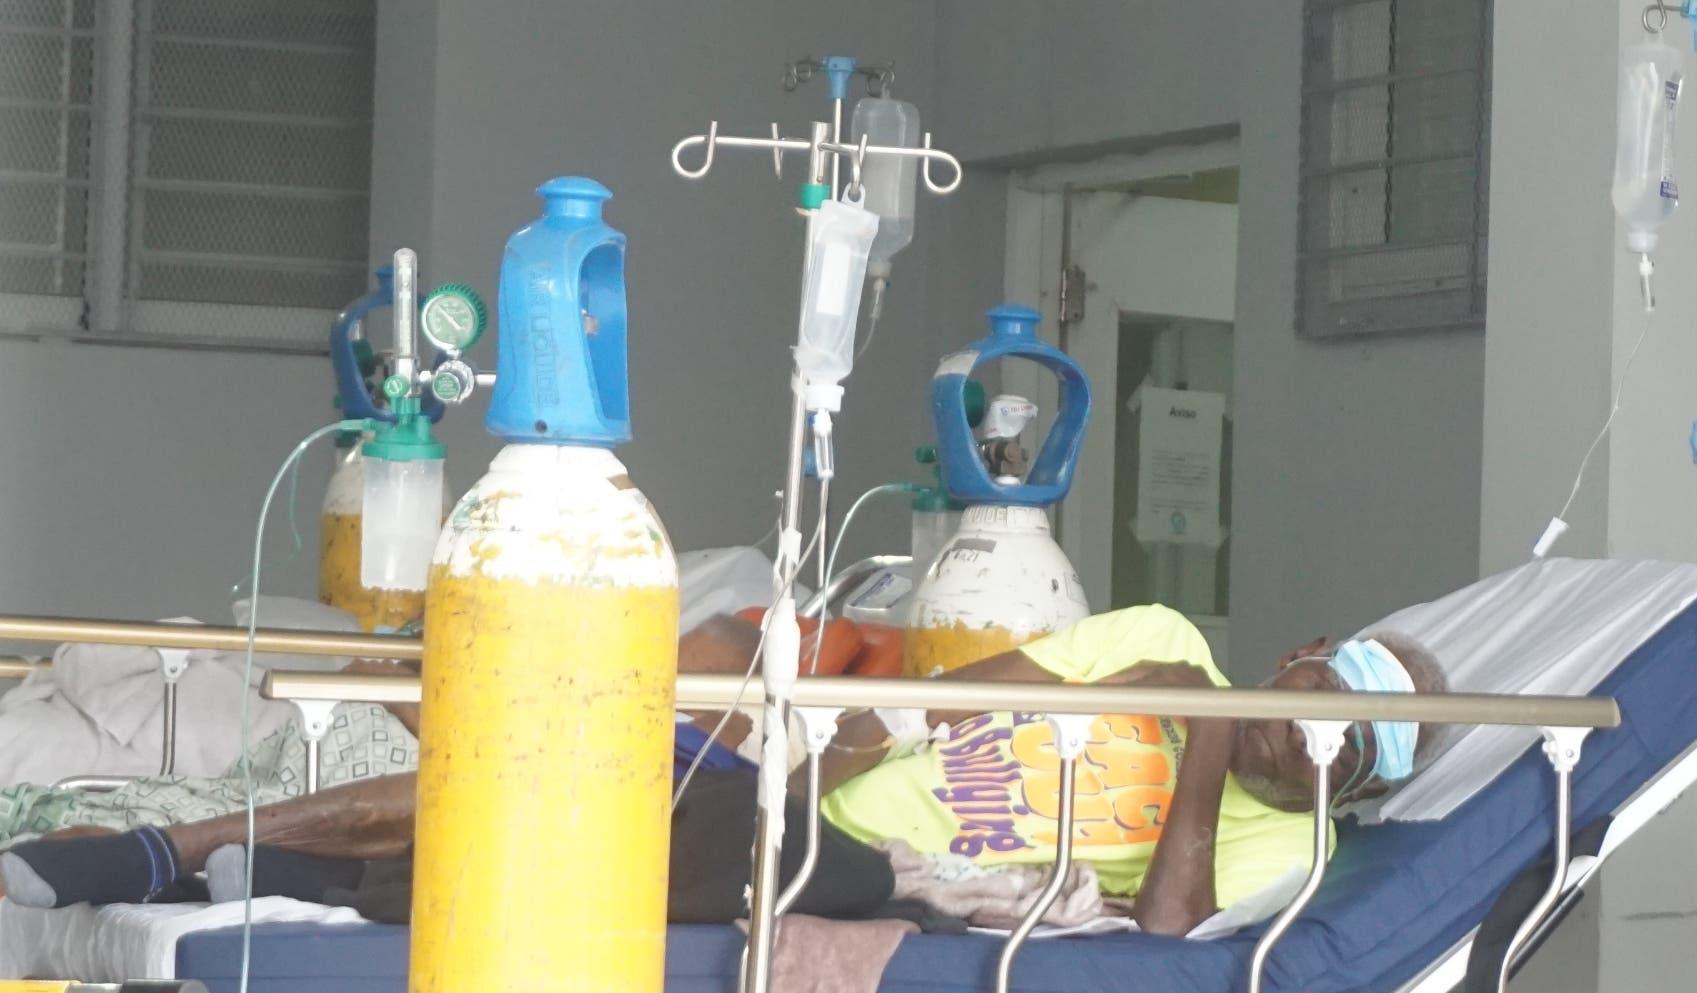 Afectados Covid-19 de provincias llegan a hospitales de la capital